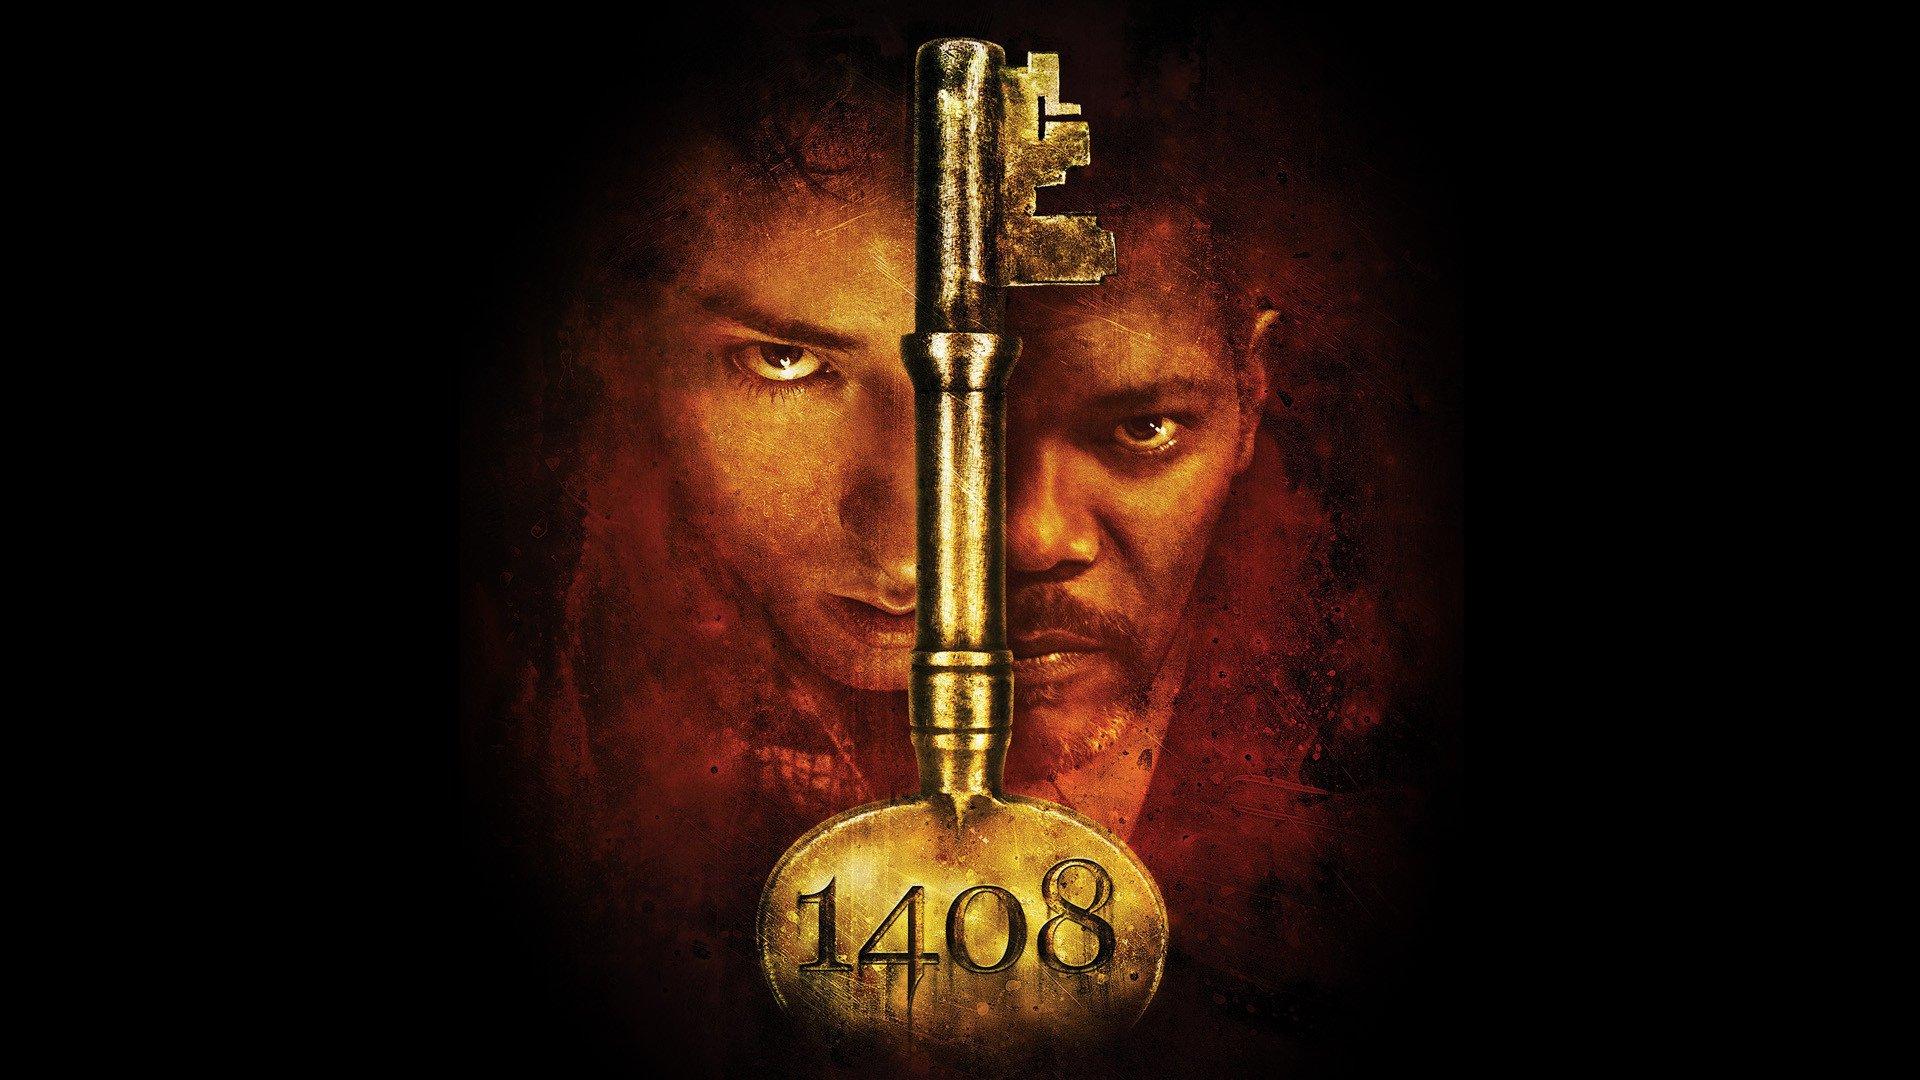 Chambre 1408 films for Chambre 1408